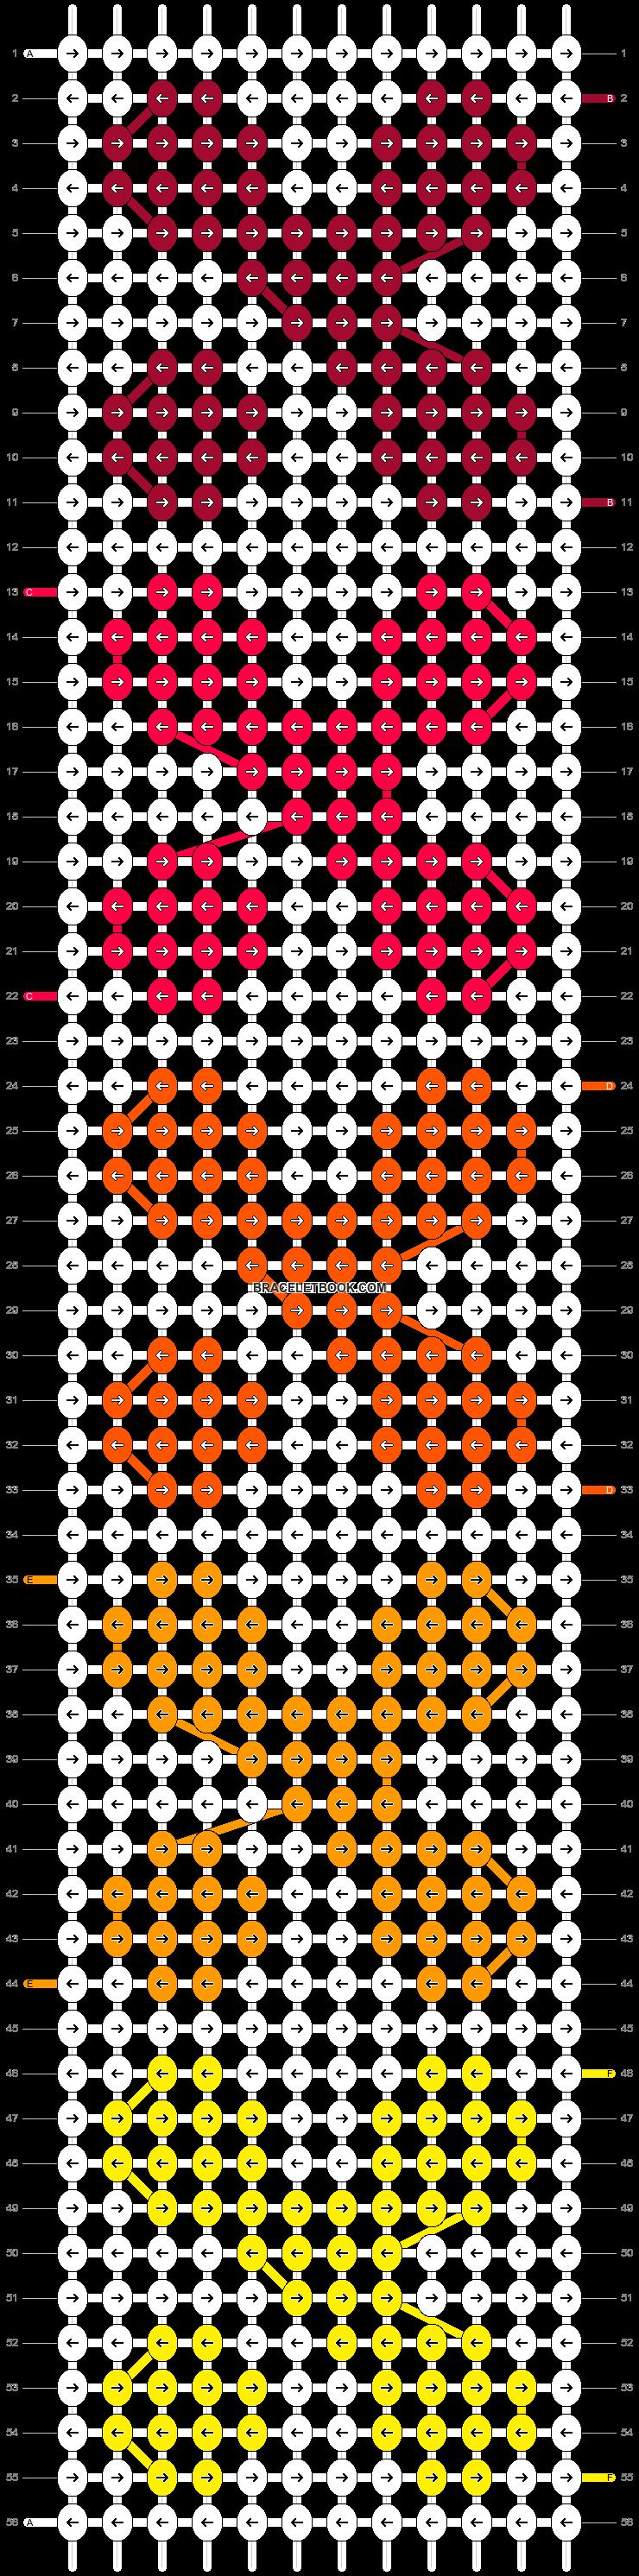 Alpha pattern #15828 pattern